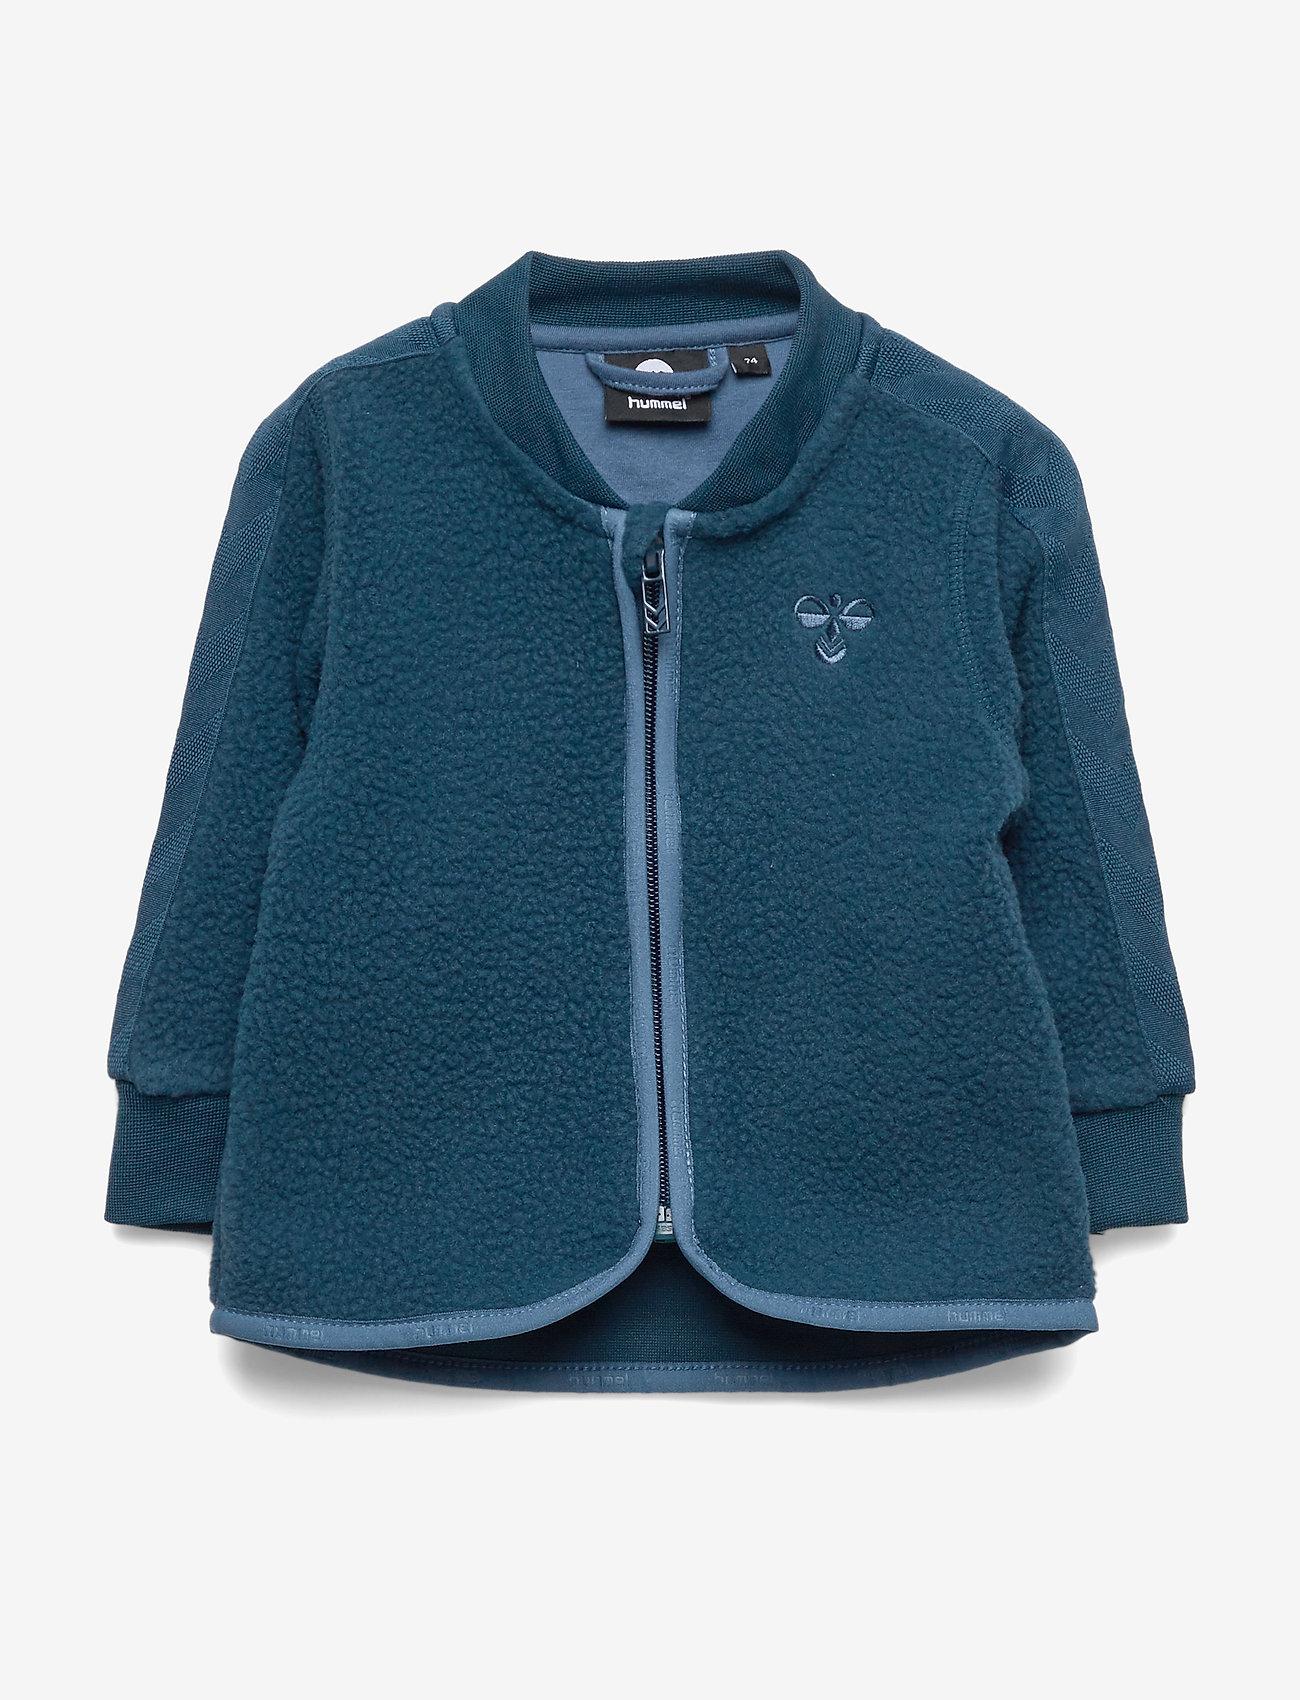 Hummel - hmlJAMIE ZIP JACKET - polar - majolica blue - 0